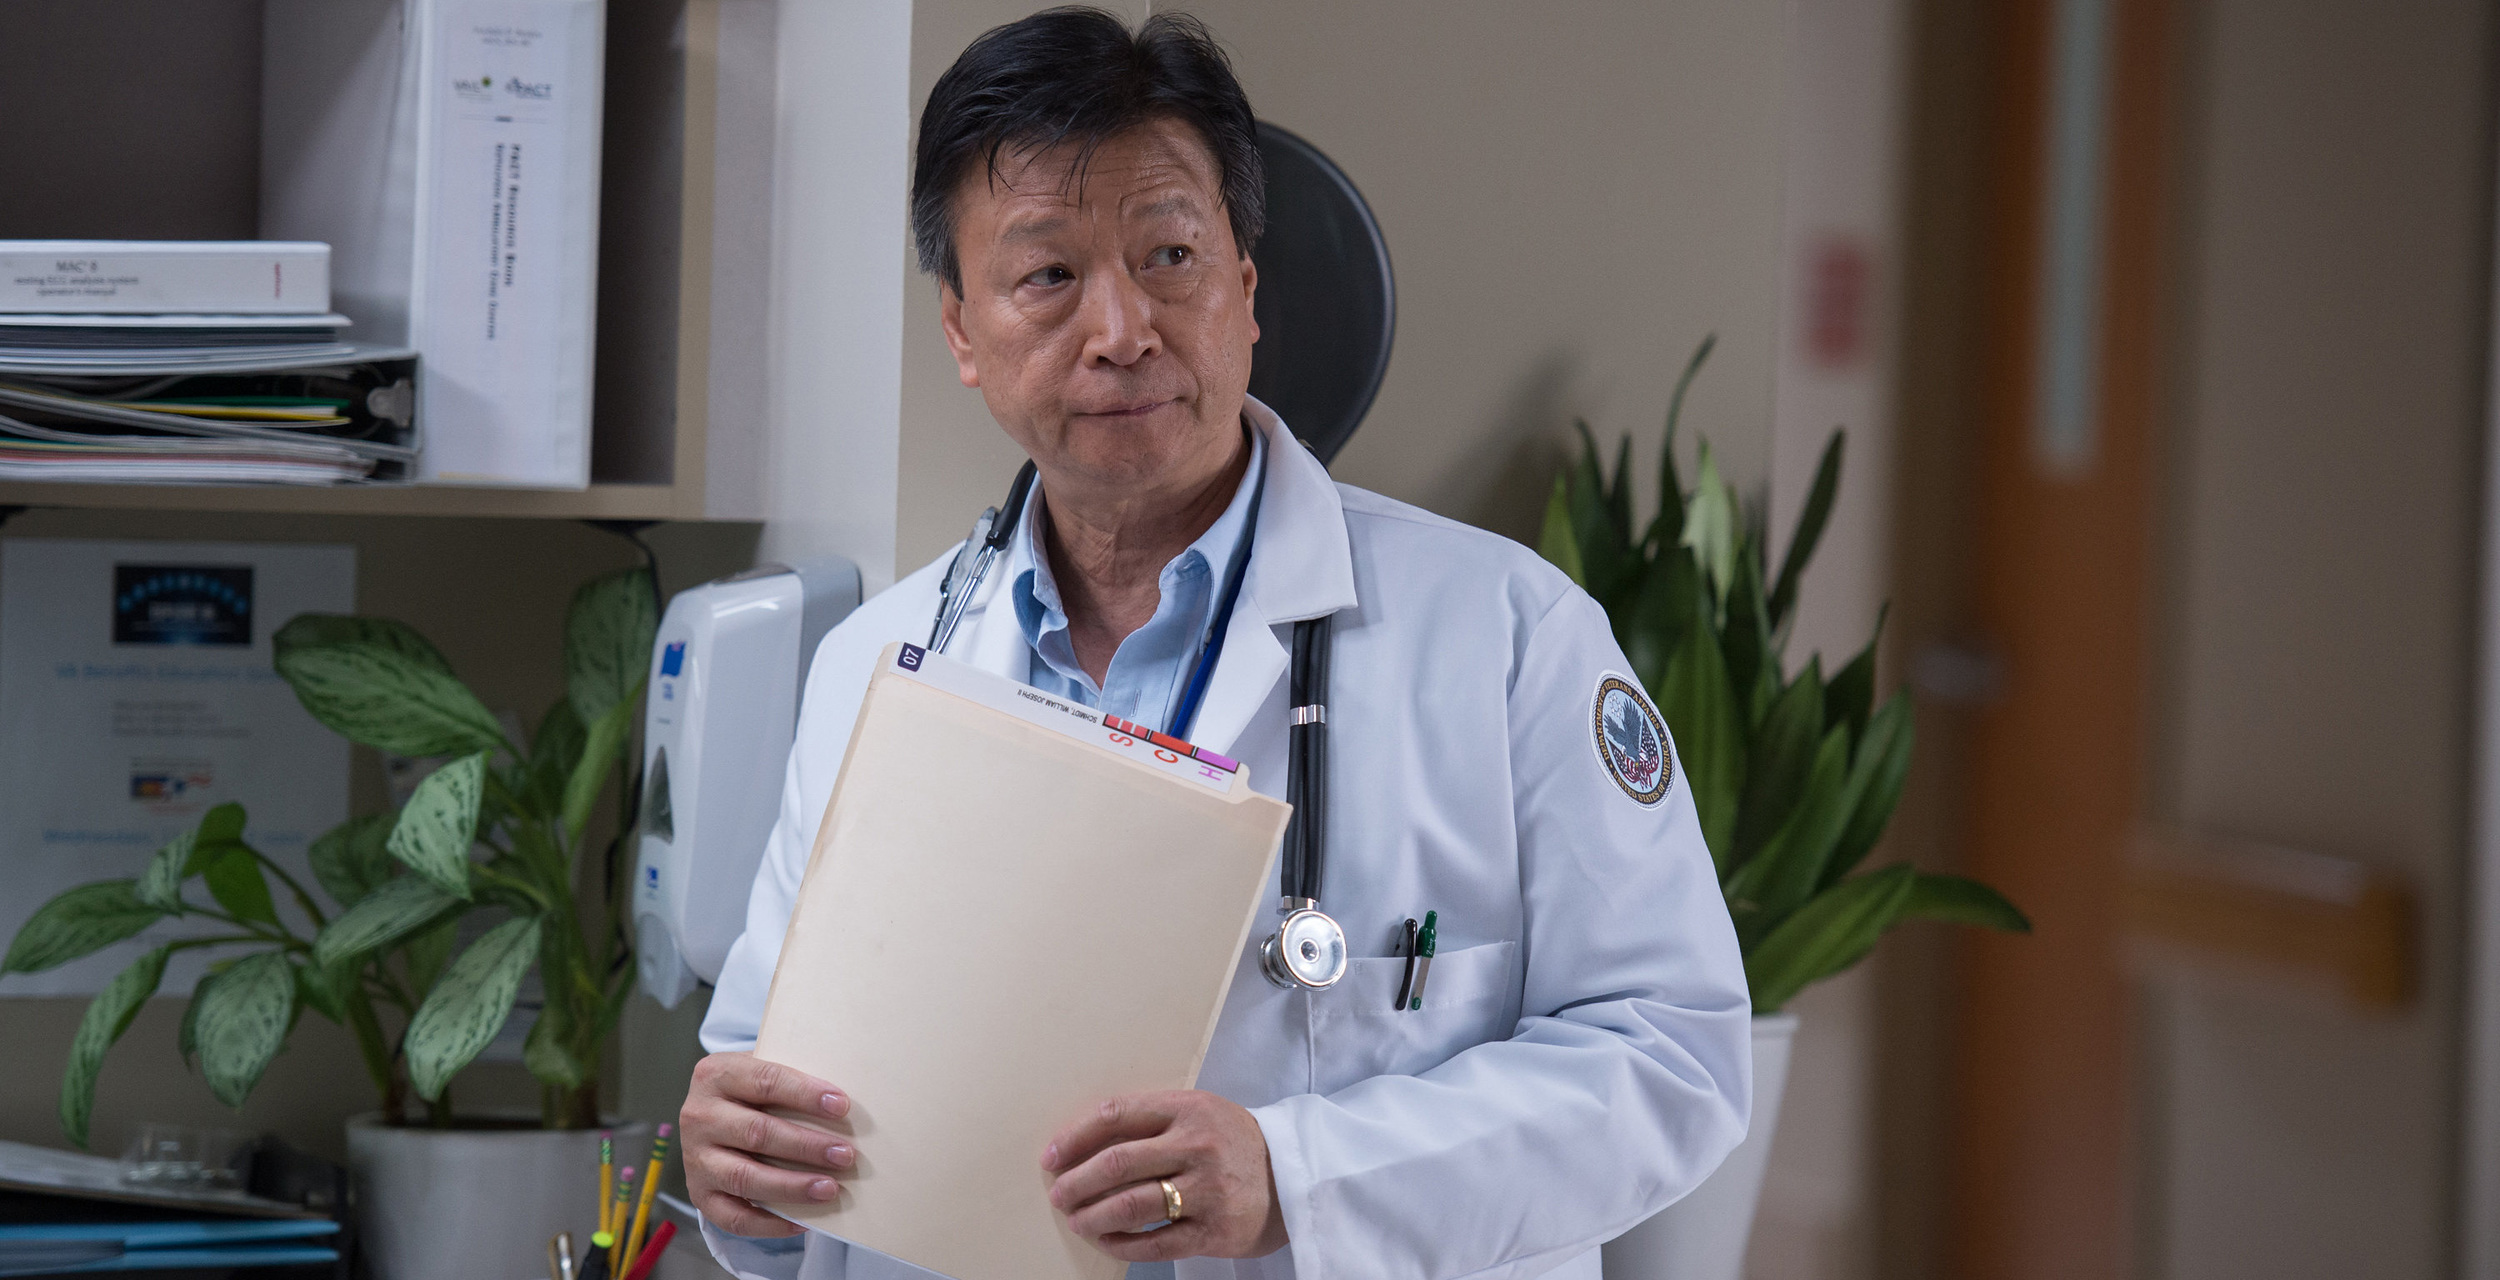 Tzi Ma for a Dept of Veterans Affairs PSA